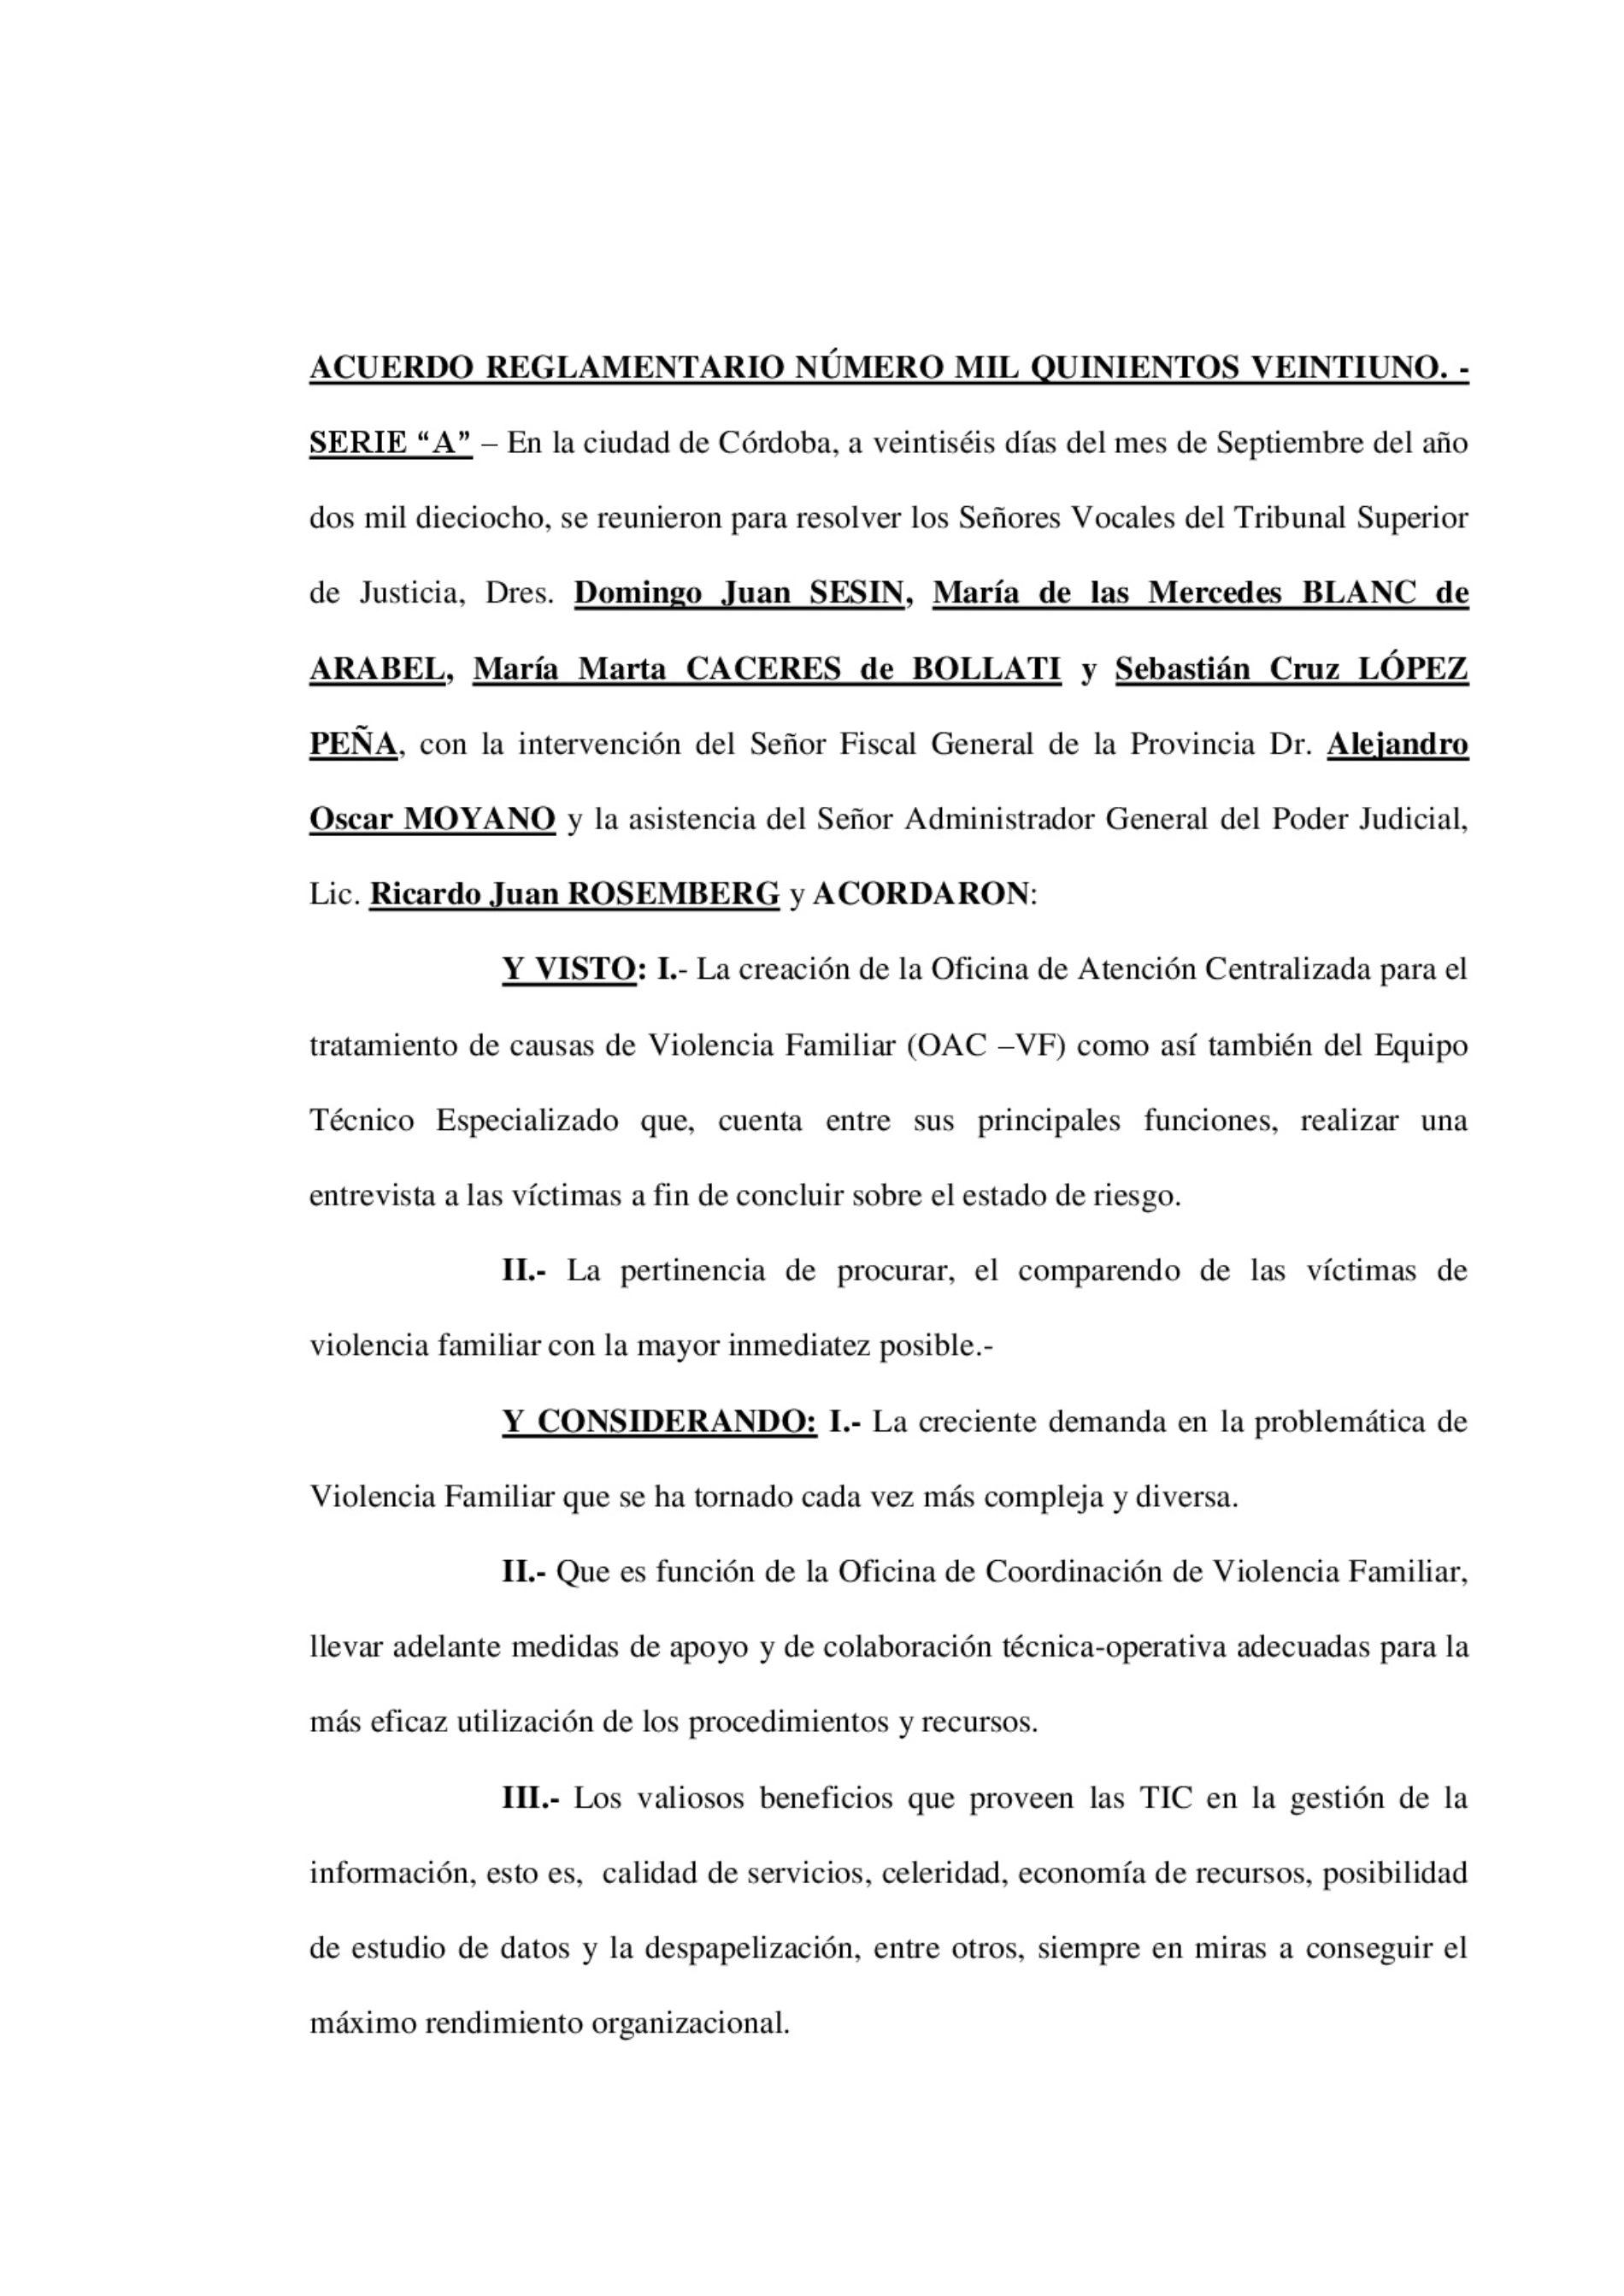 «Superior Tribunal de Córdoba (Acuerdo novedoso): Protocolo de comunicación electrónica c/víctimas de violencia de whatsapp»